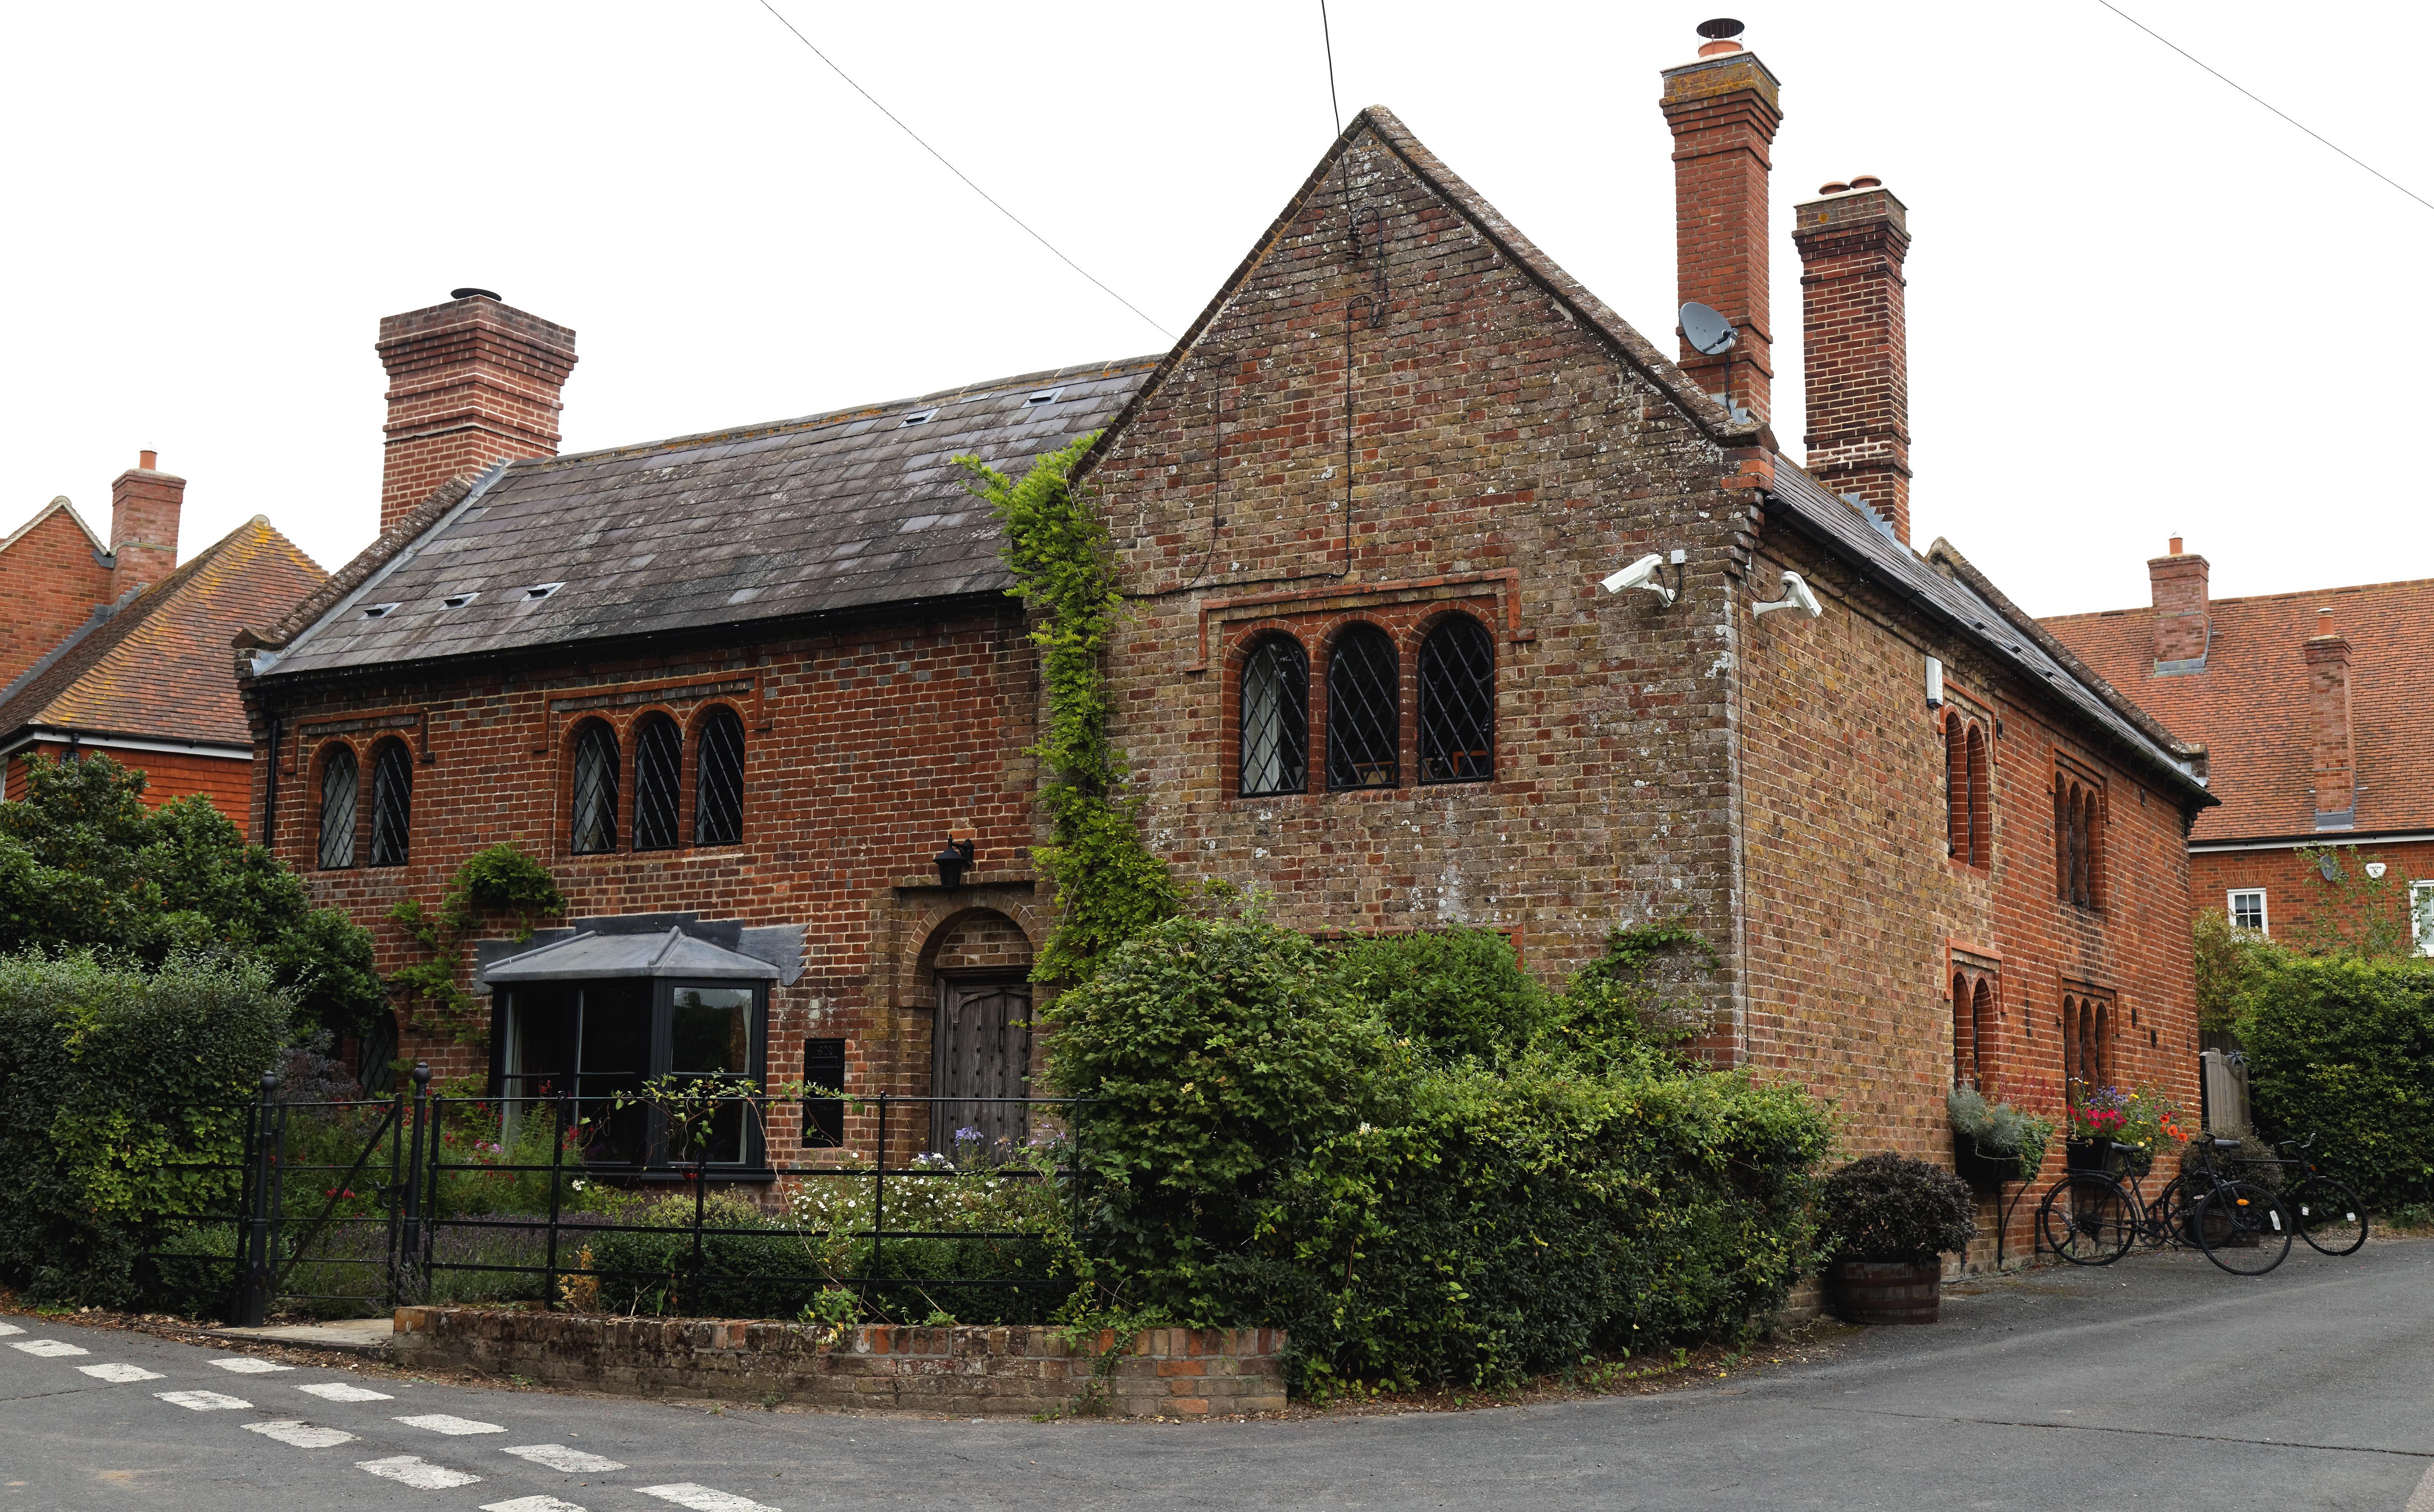 File:Brick House Goodnestone Dover Kent England 1